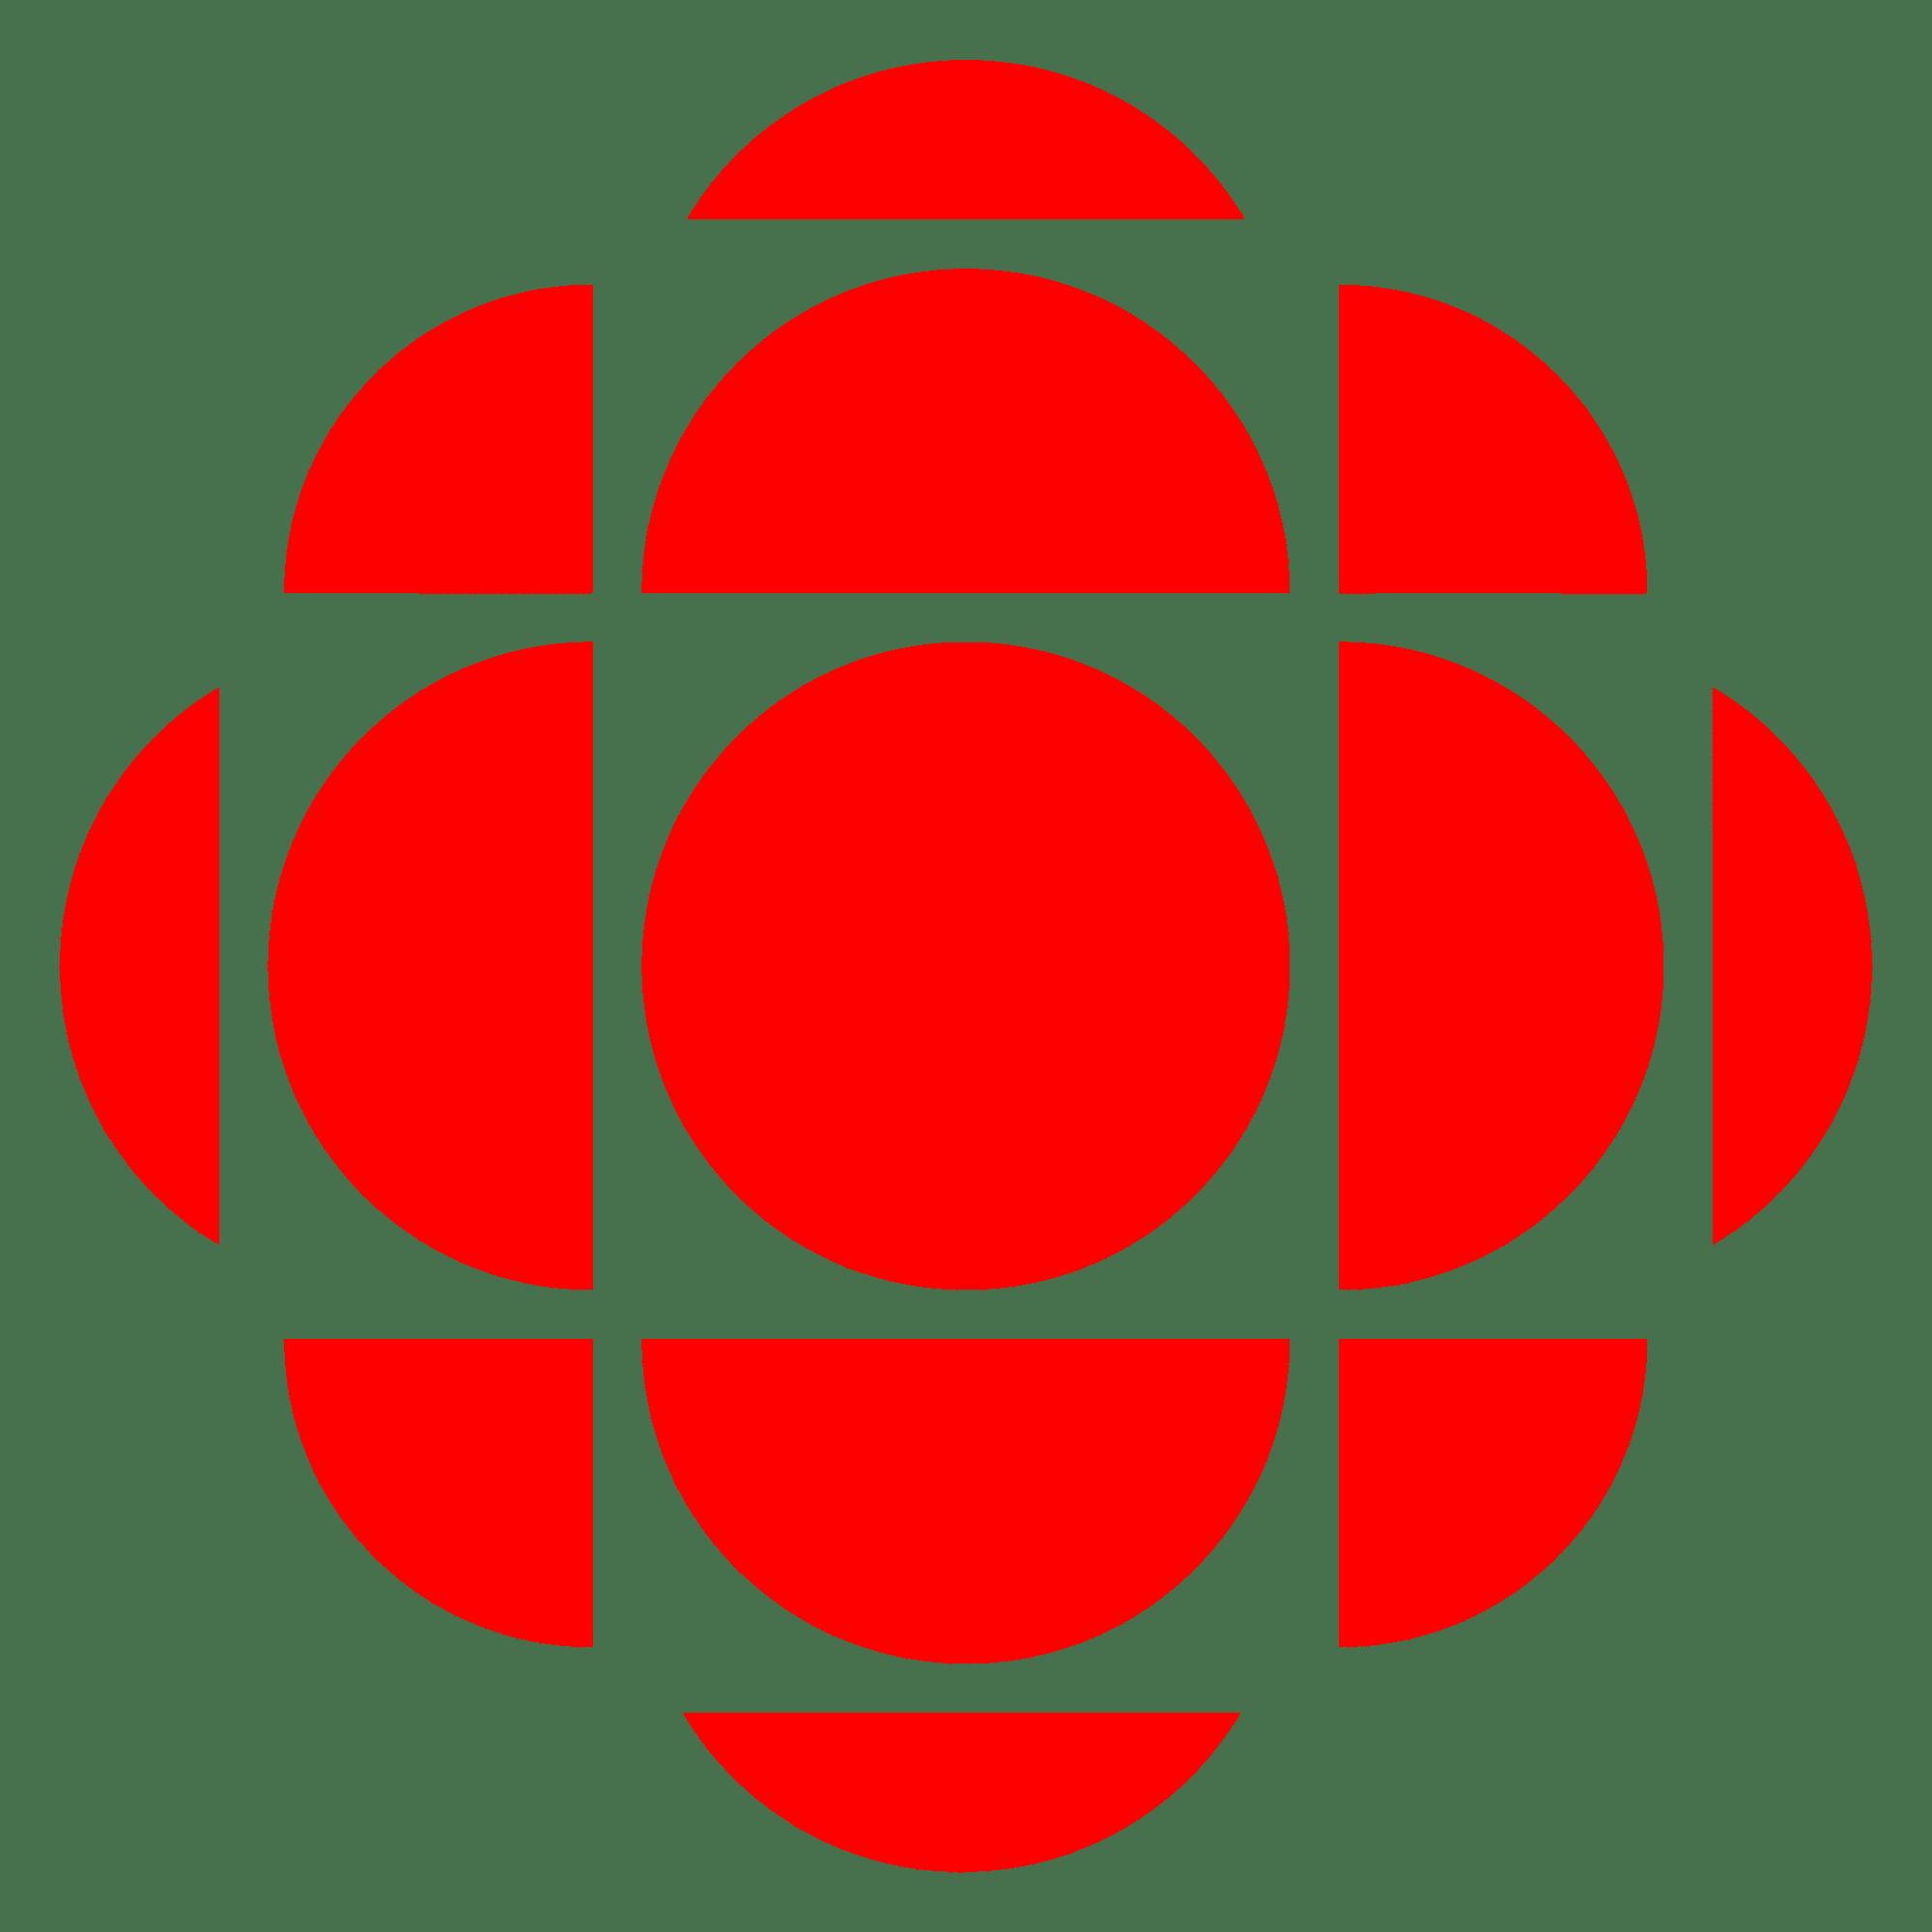 CBC Fast Forward: When Robots Take Over